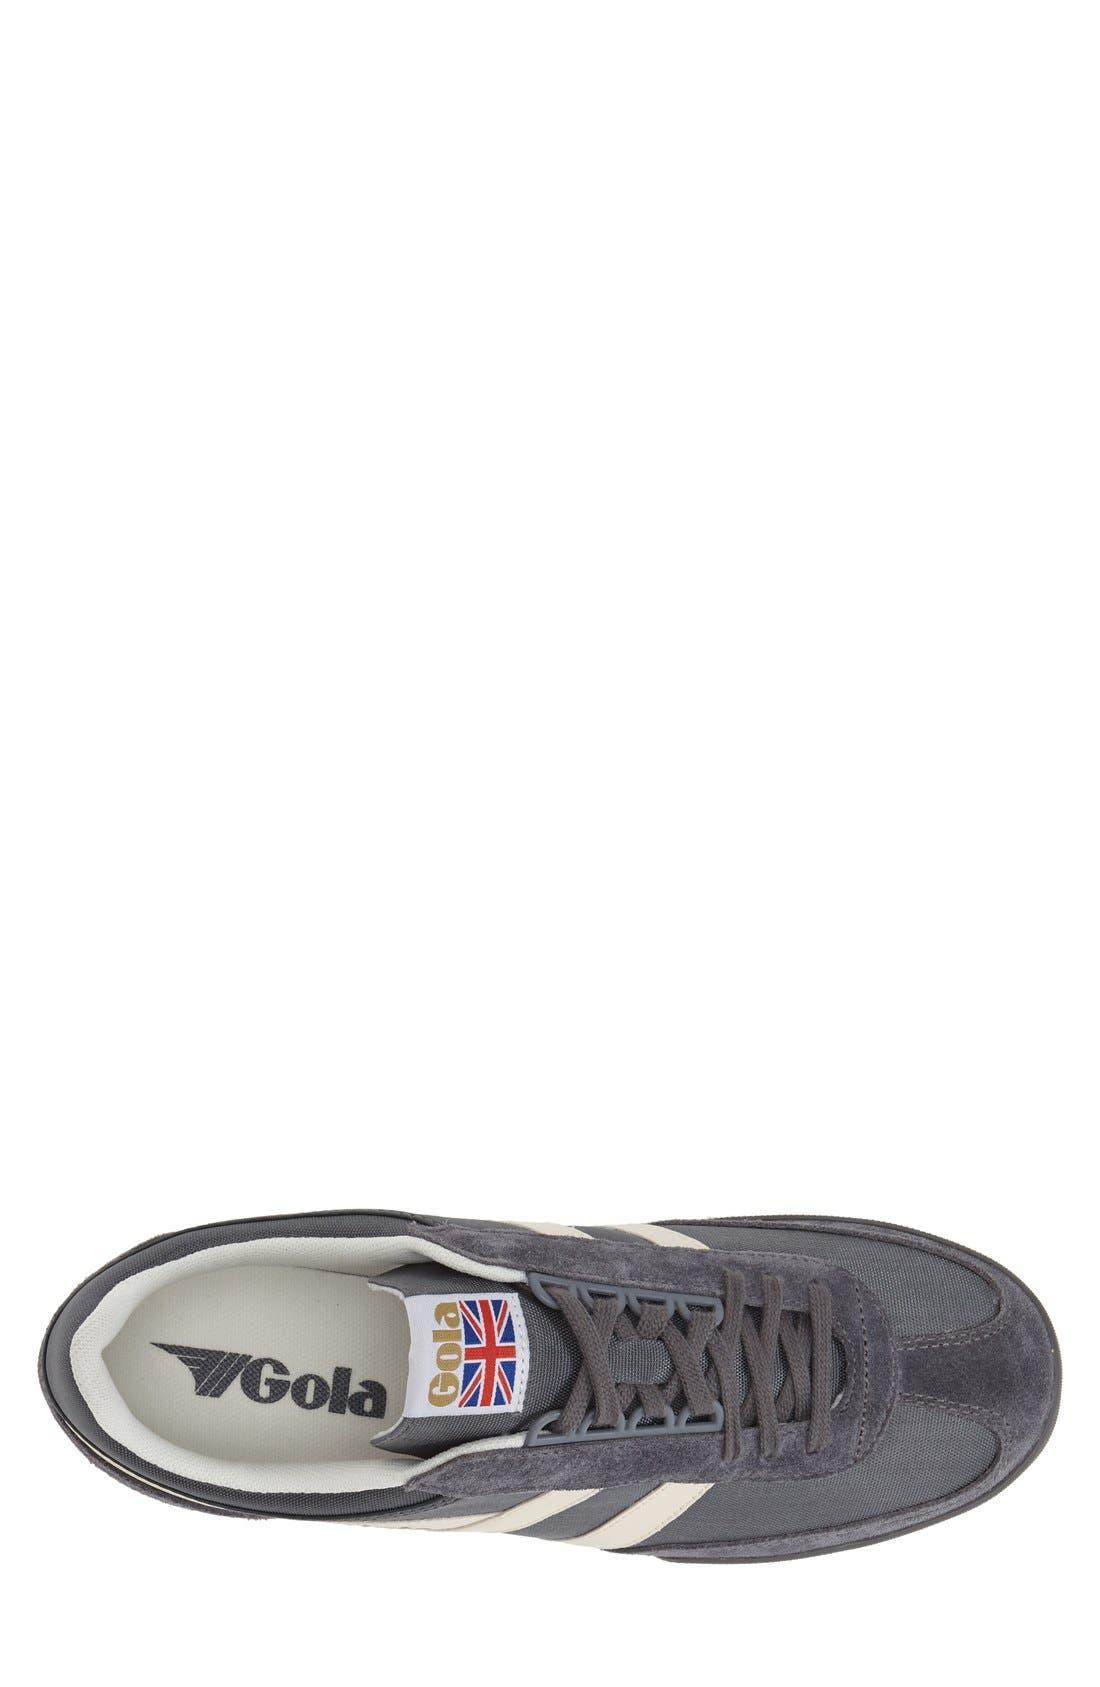 'Super Harrier' Leather Sneaker,                             Alternate thumbnail 2, color,                             022